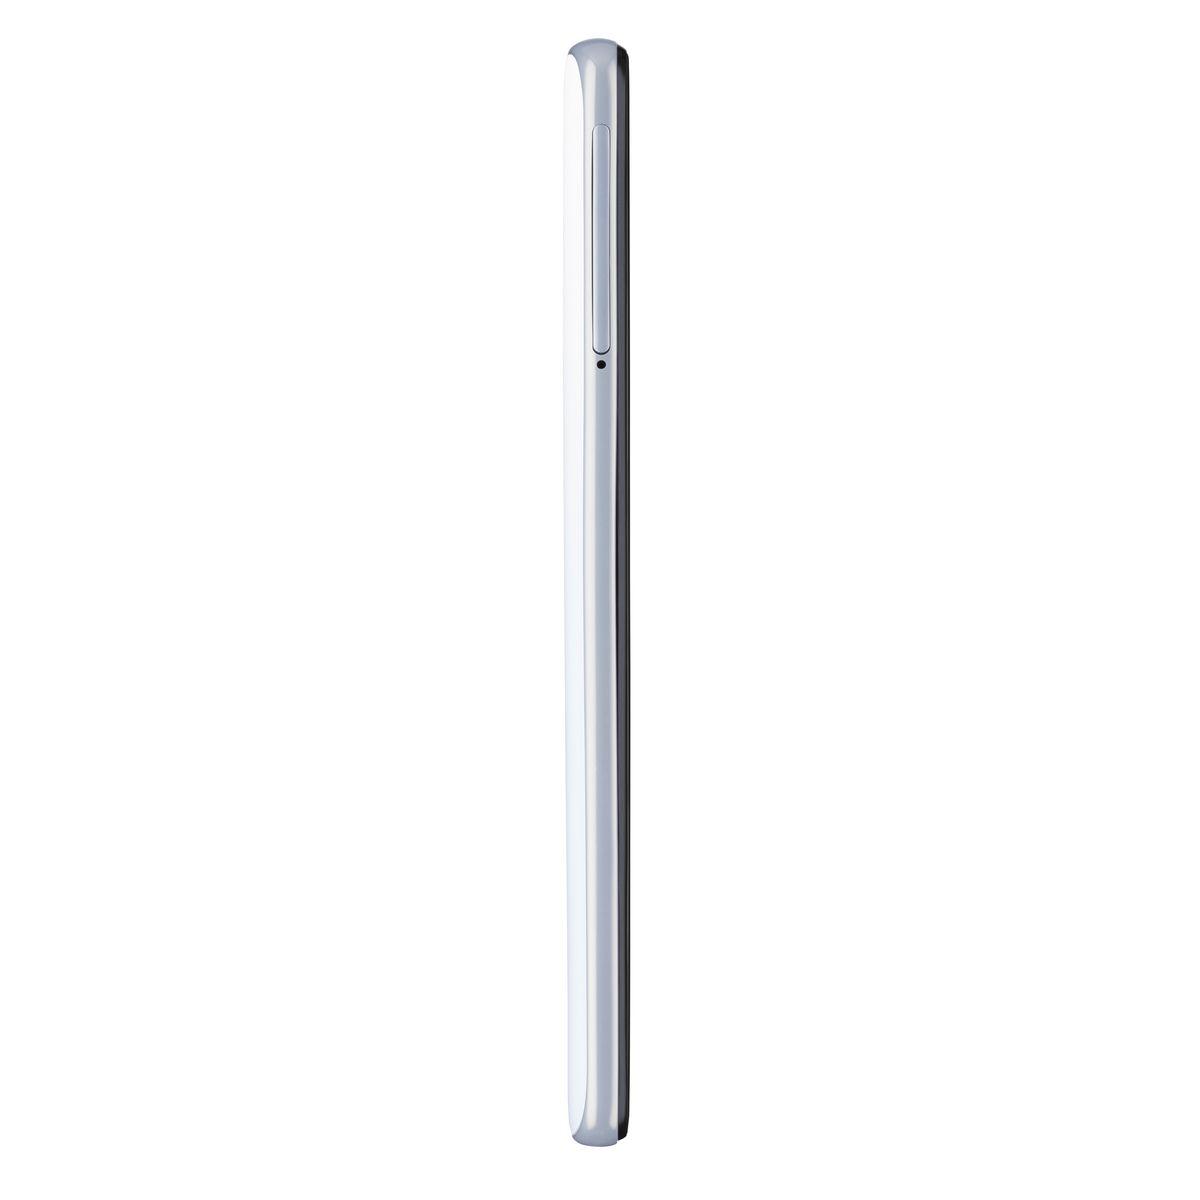 SAMSUNG Smartphone - GALAXY A40 - 64 Go - 5.9 pouces - Blanc - 4G - Double port nano SIM